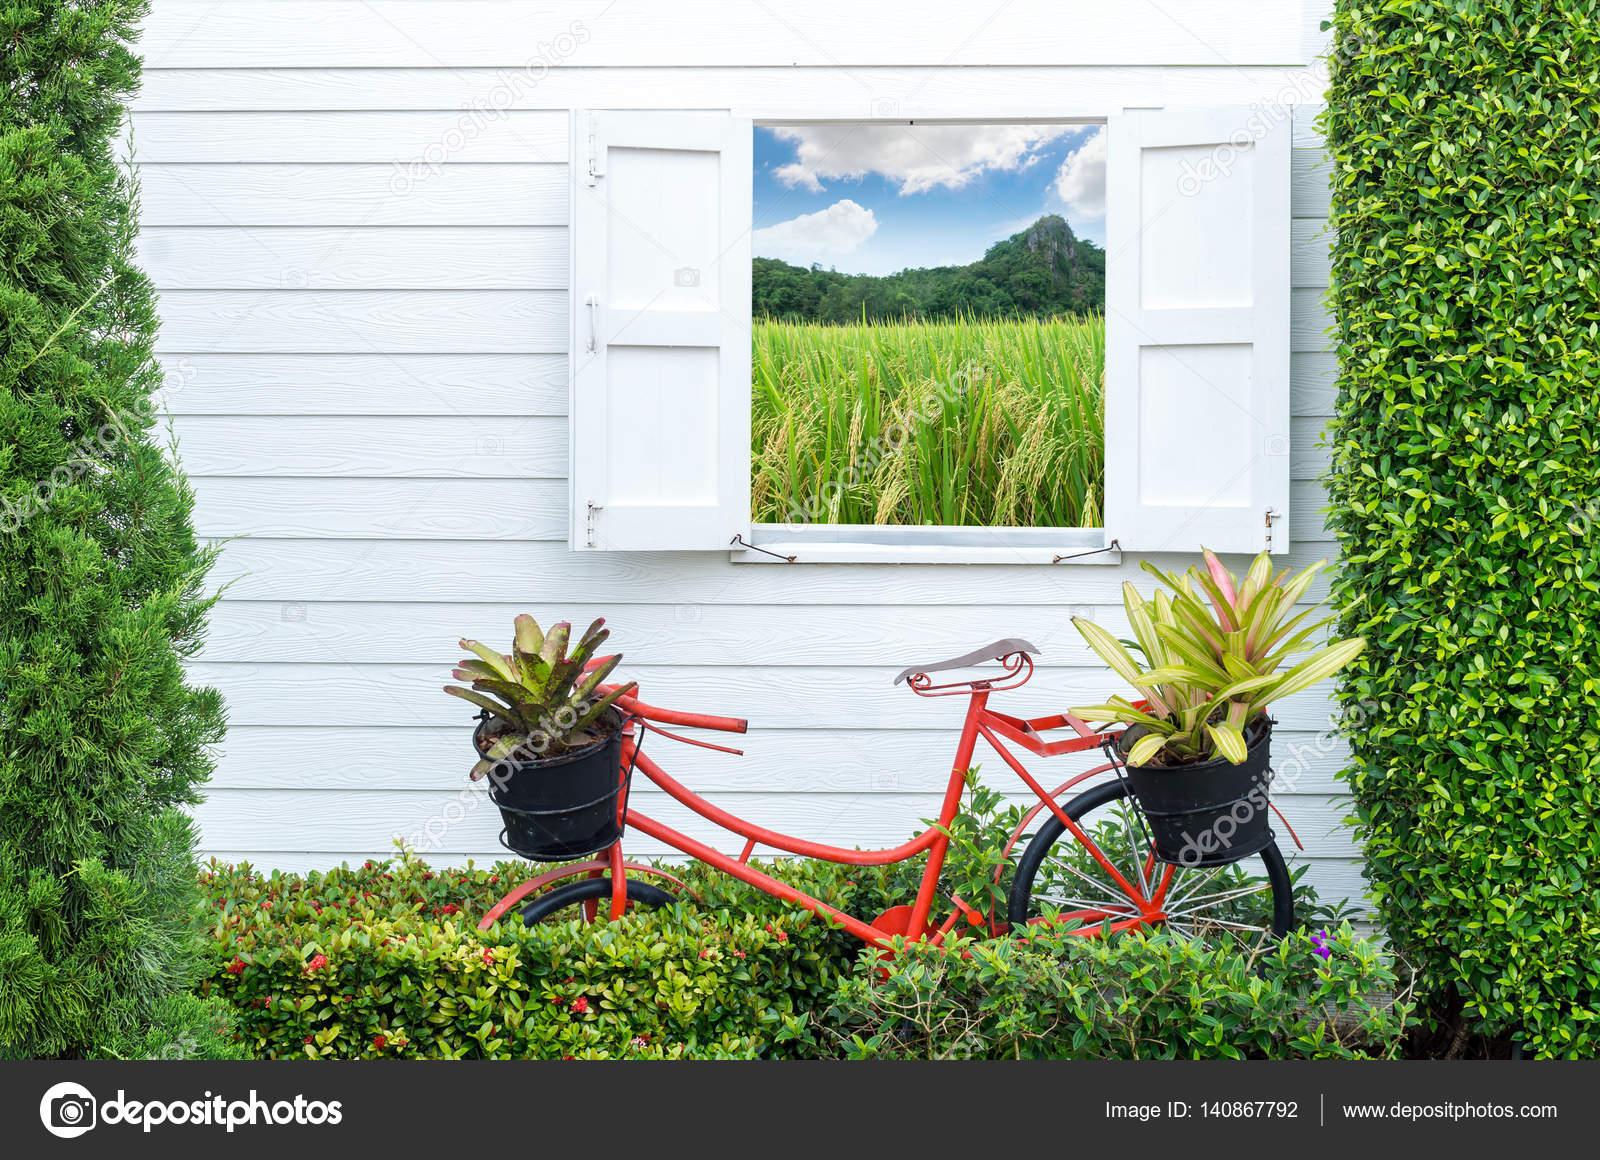 Decorate gardening with bicycle — Stock Photo © Tzido #140867792